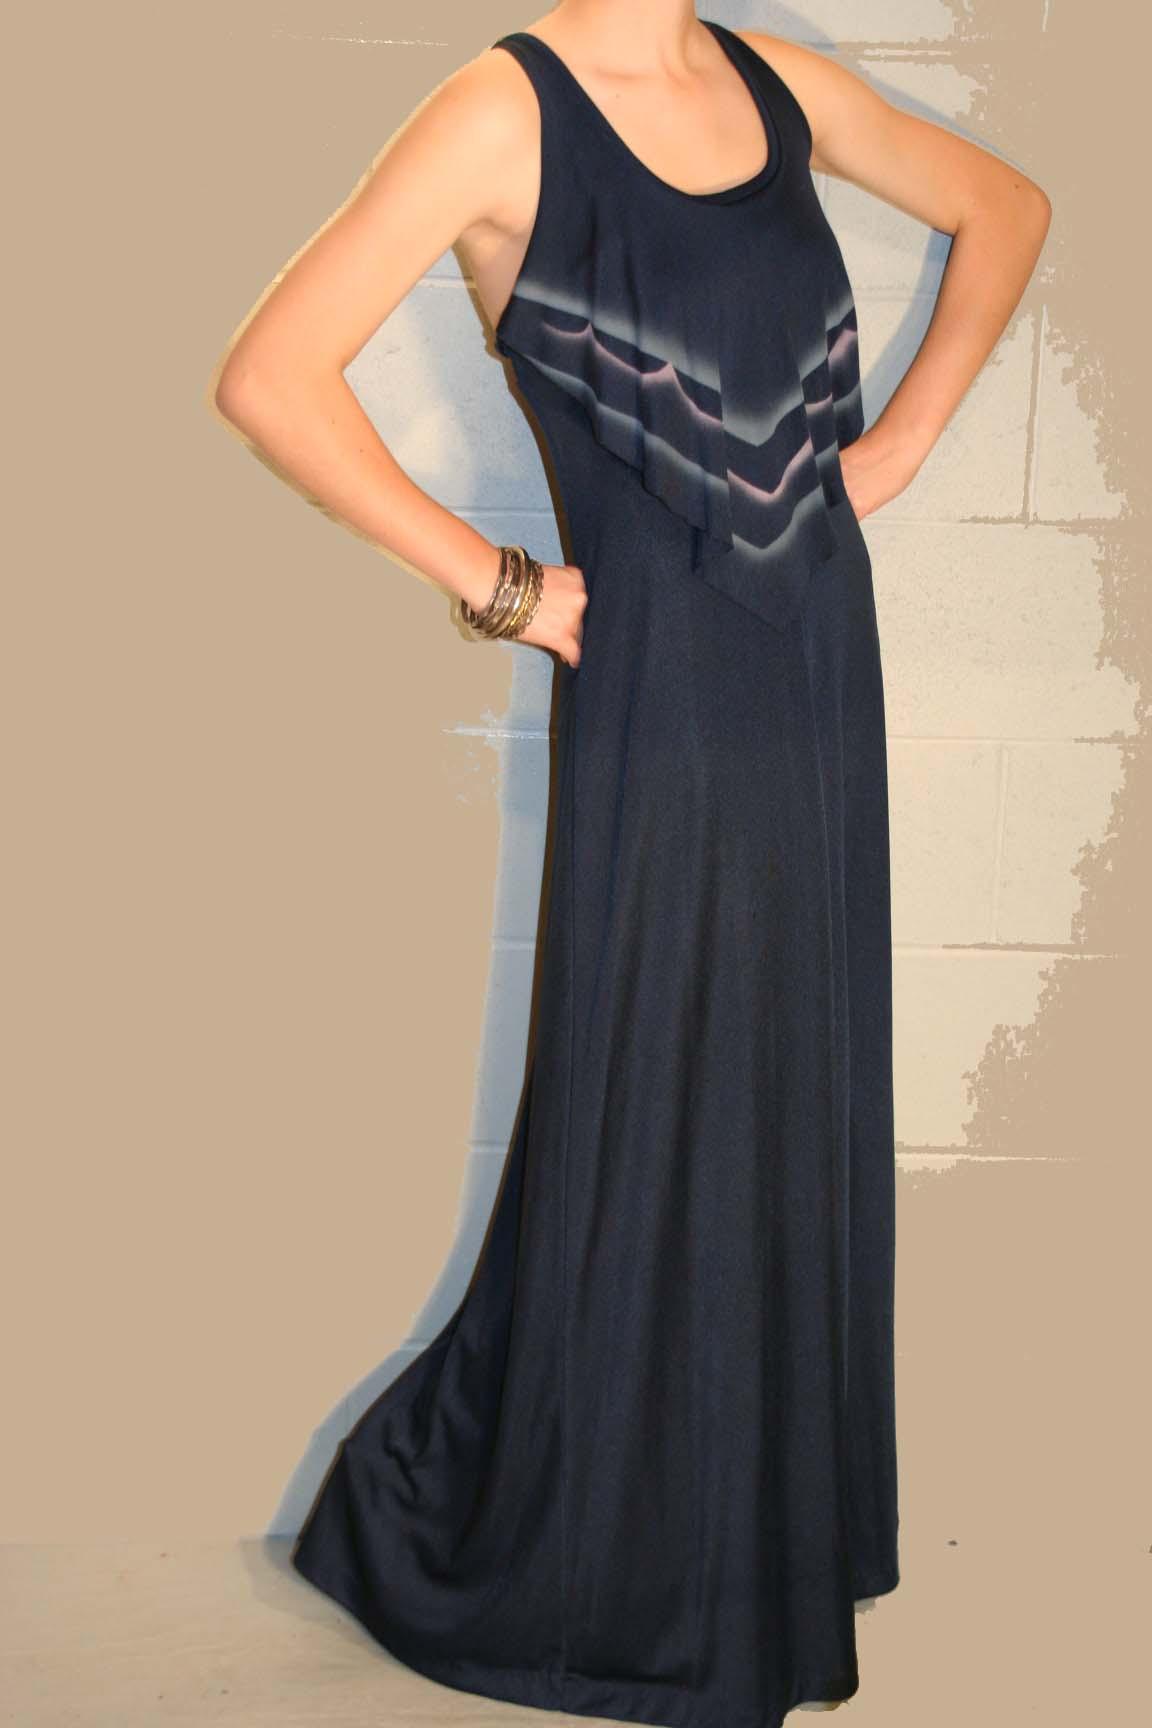 NAVY BLUE VTG 70s HIPPIE BOHO MAXI LONG HALTER DRESS XS~S